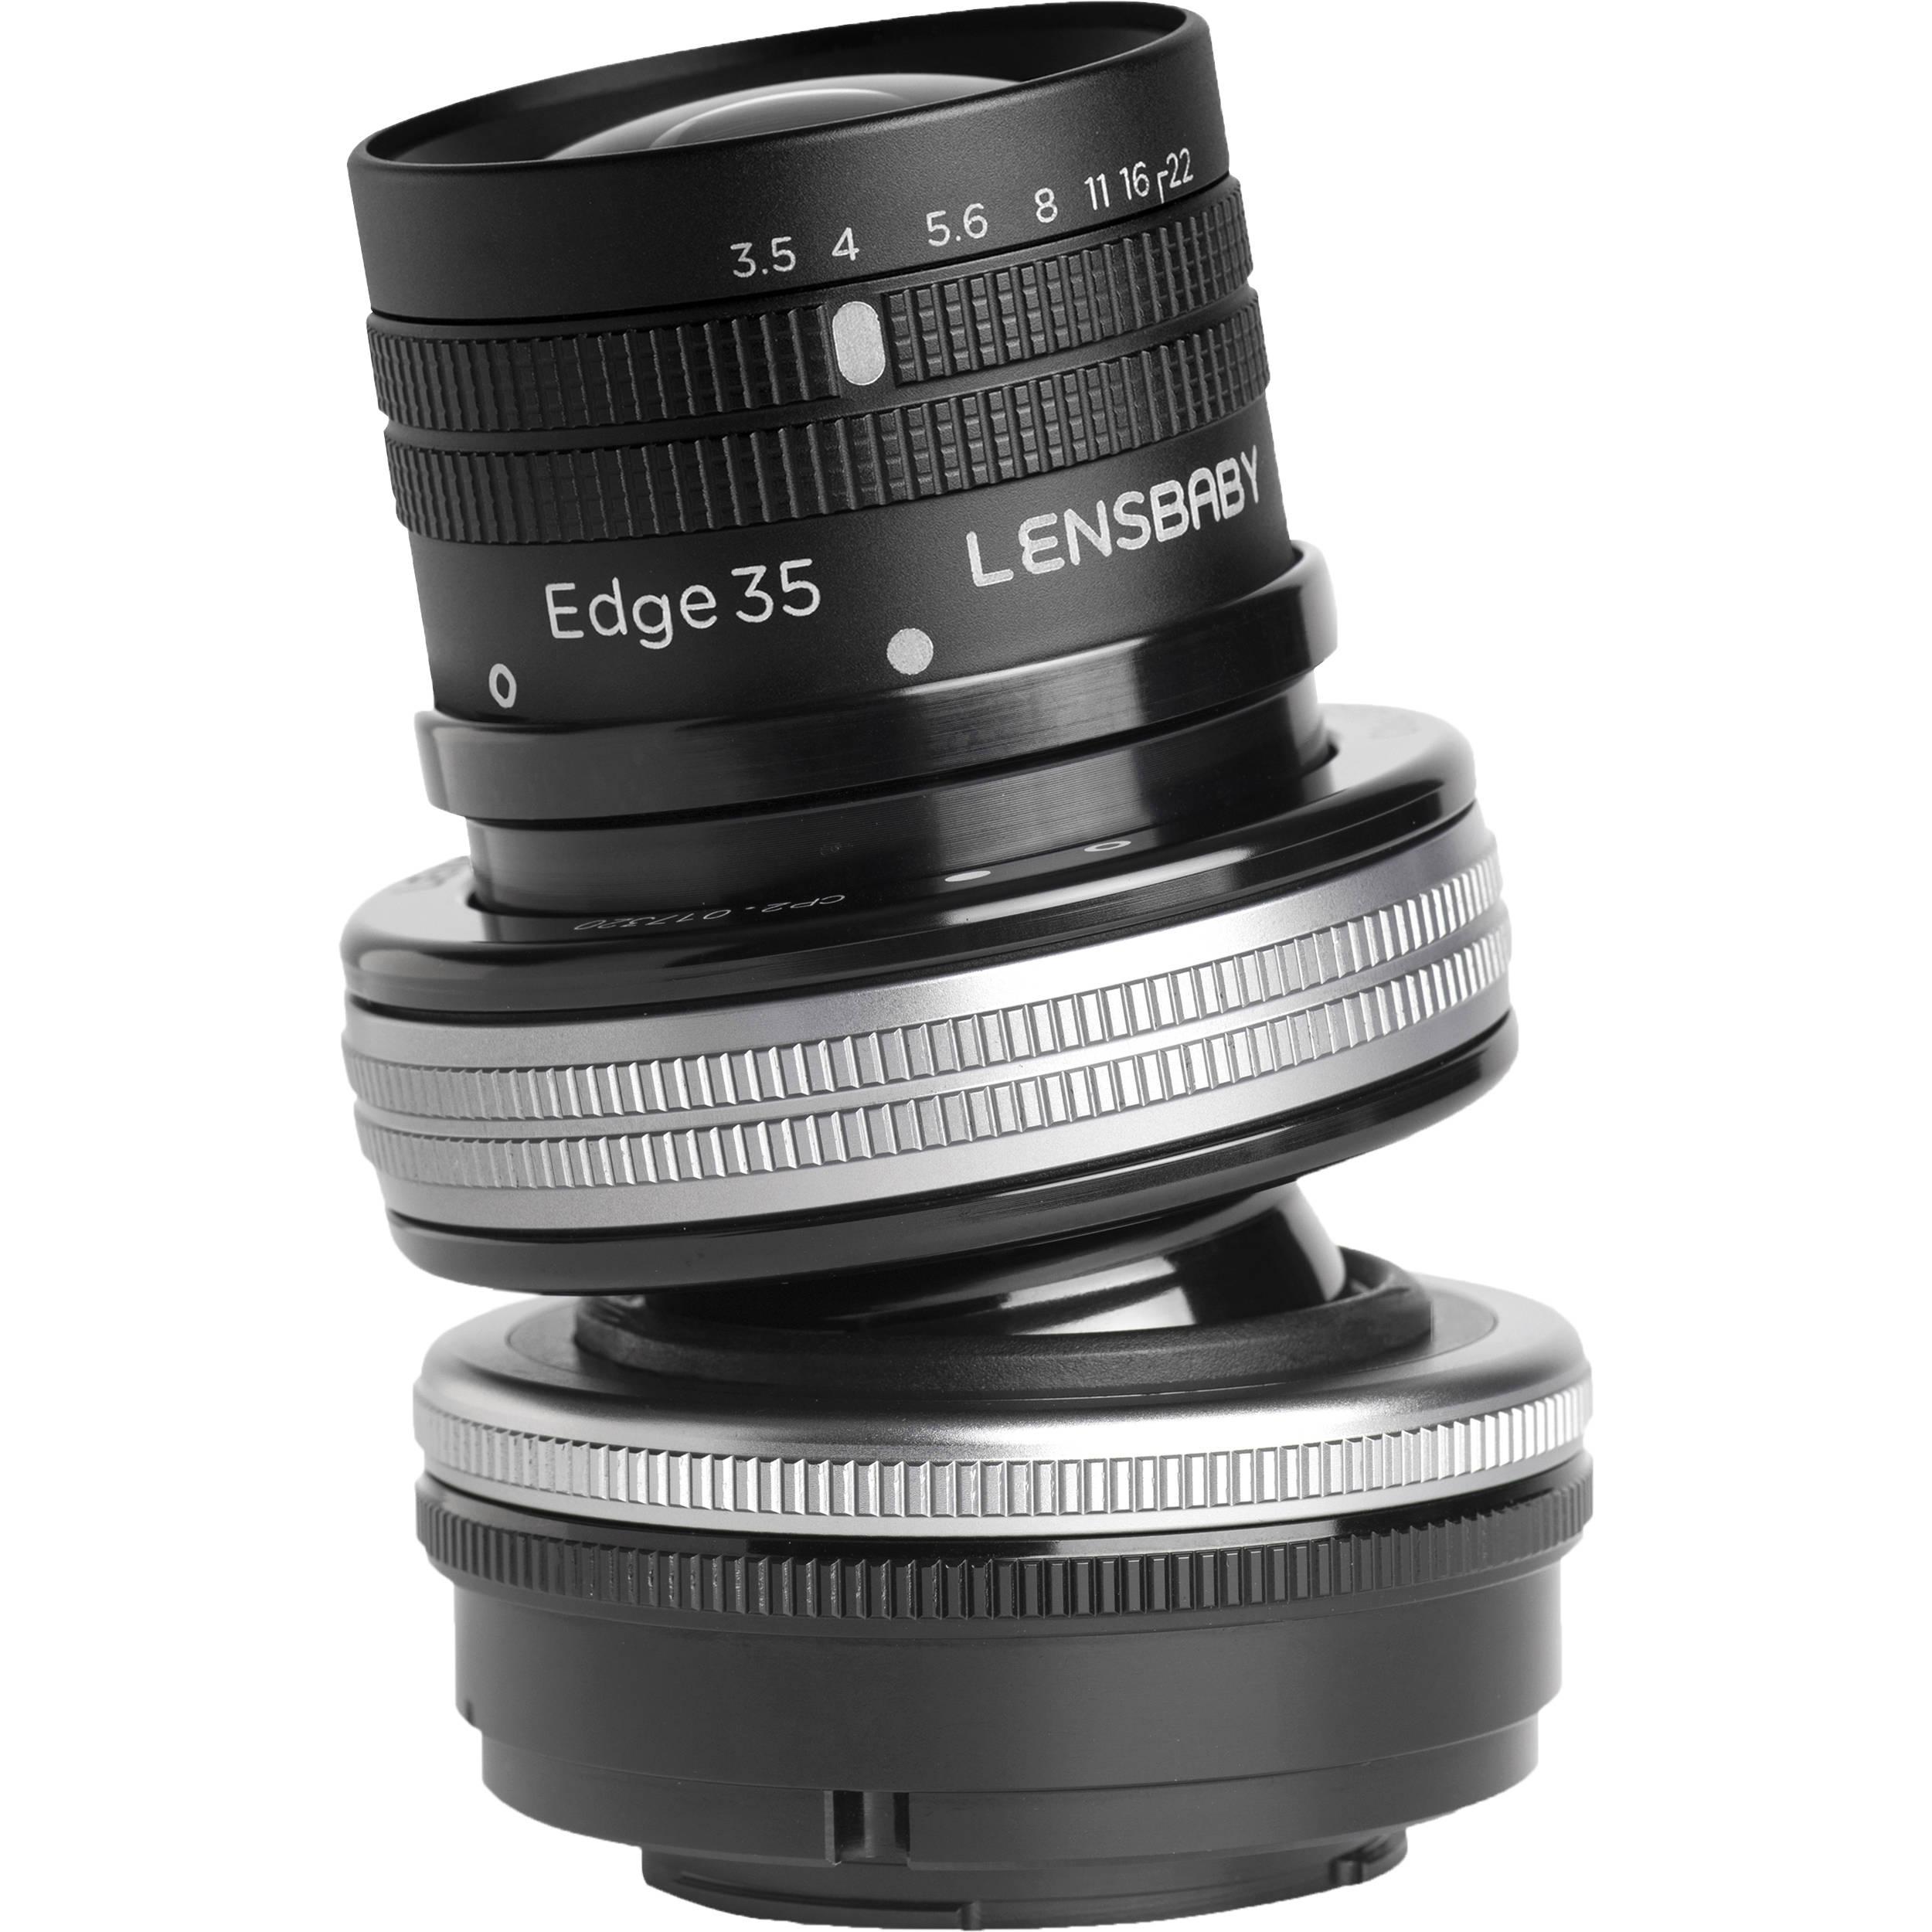 LENSBABY Composer Pro II Edge 35 pro Nikon F